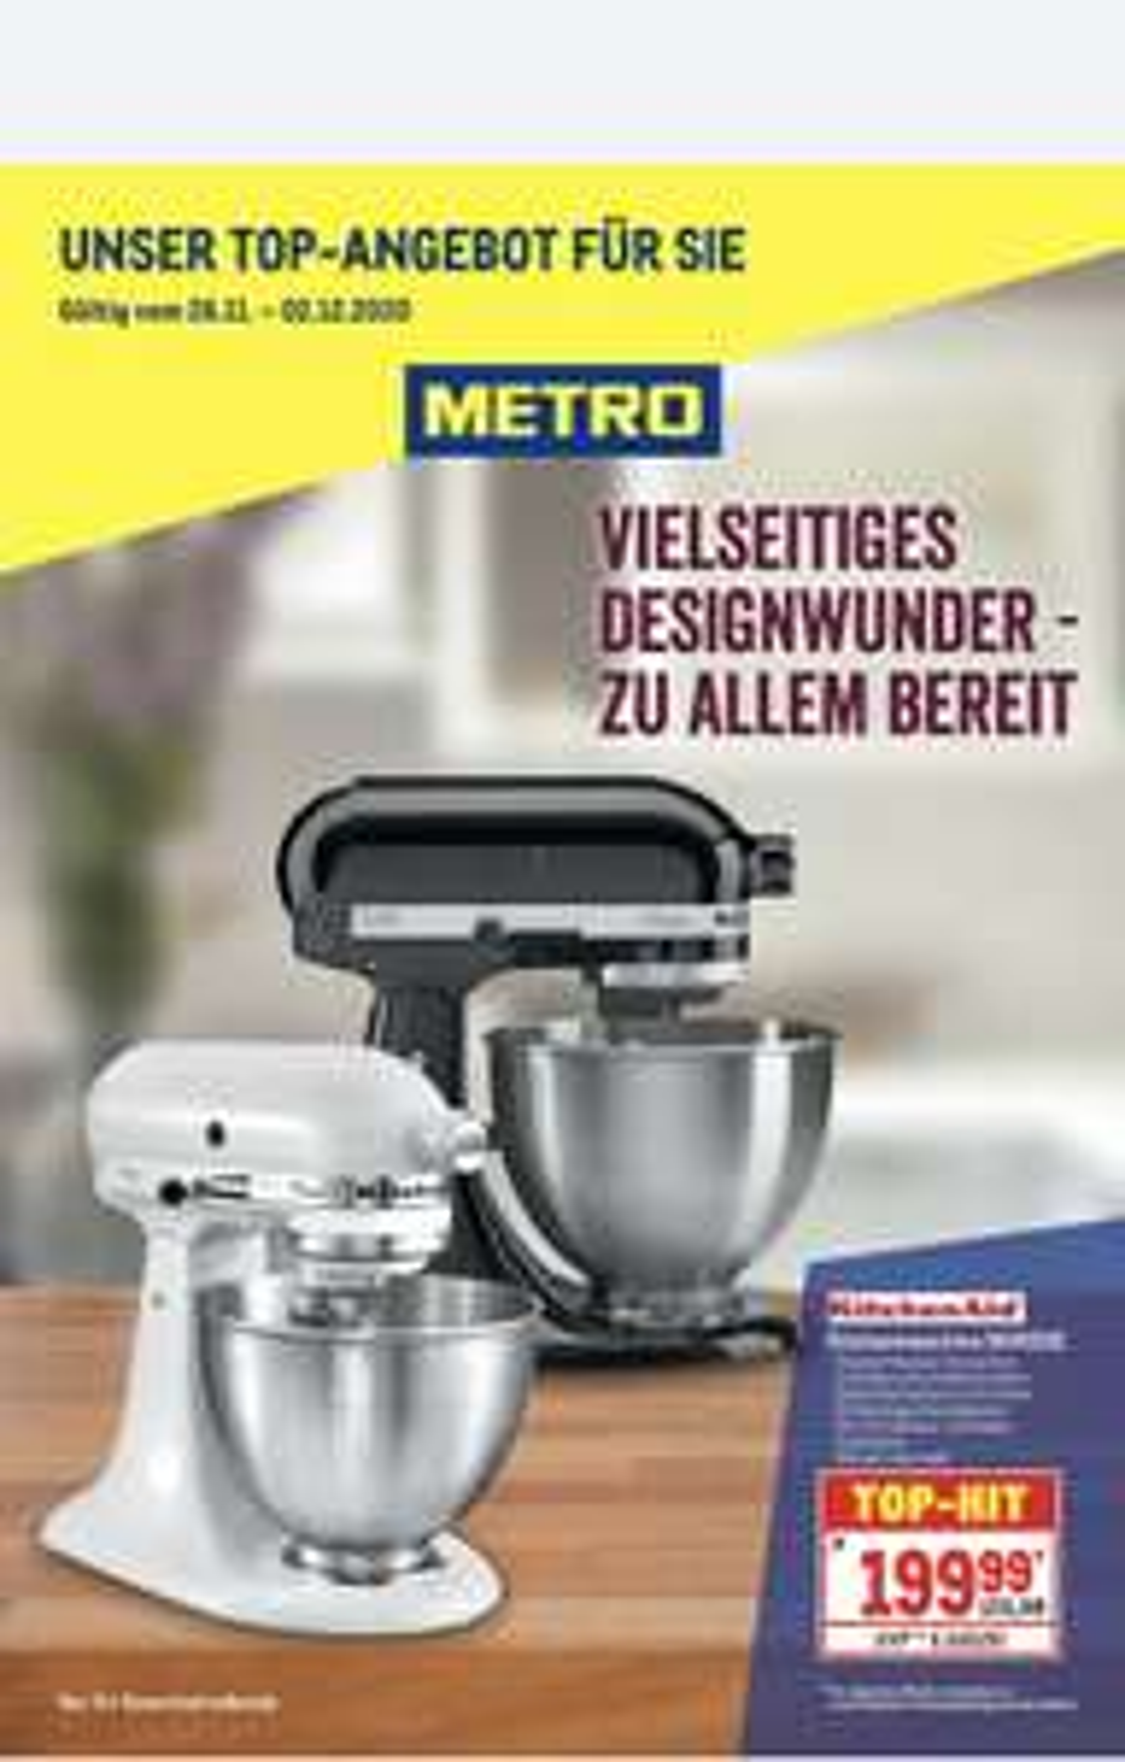 KitchenAid 5K45SSE (Metro)